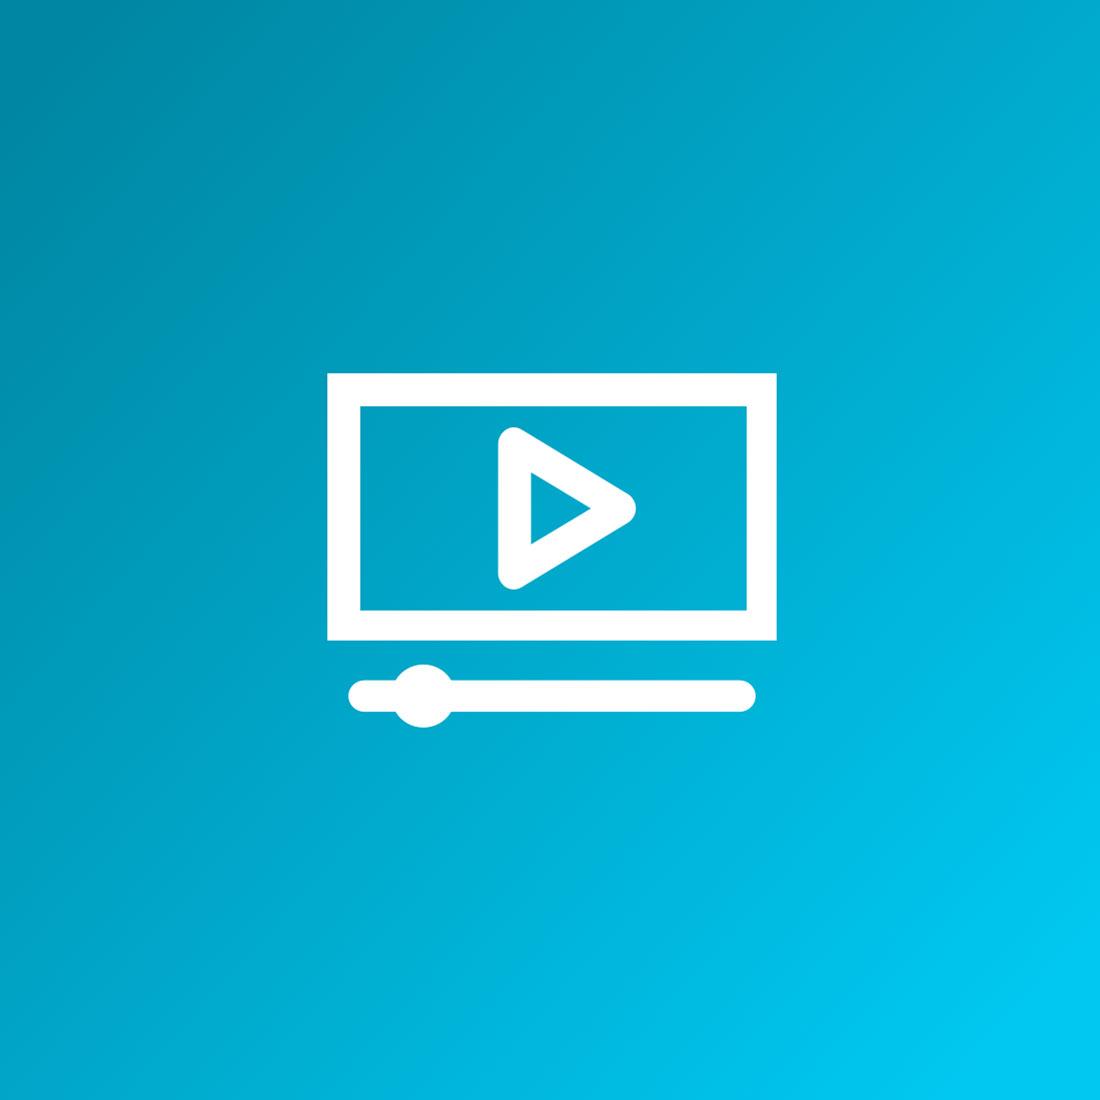 Logo Mediathek, Rechte: WDR